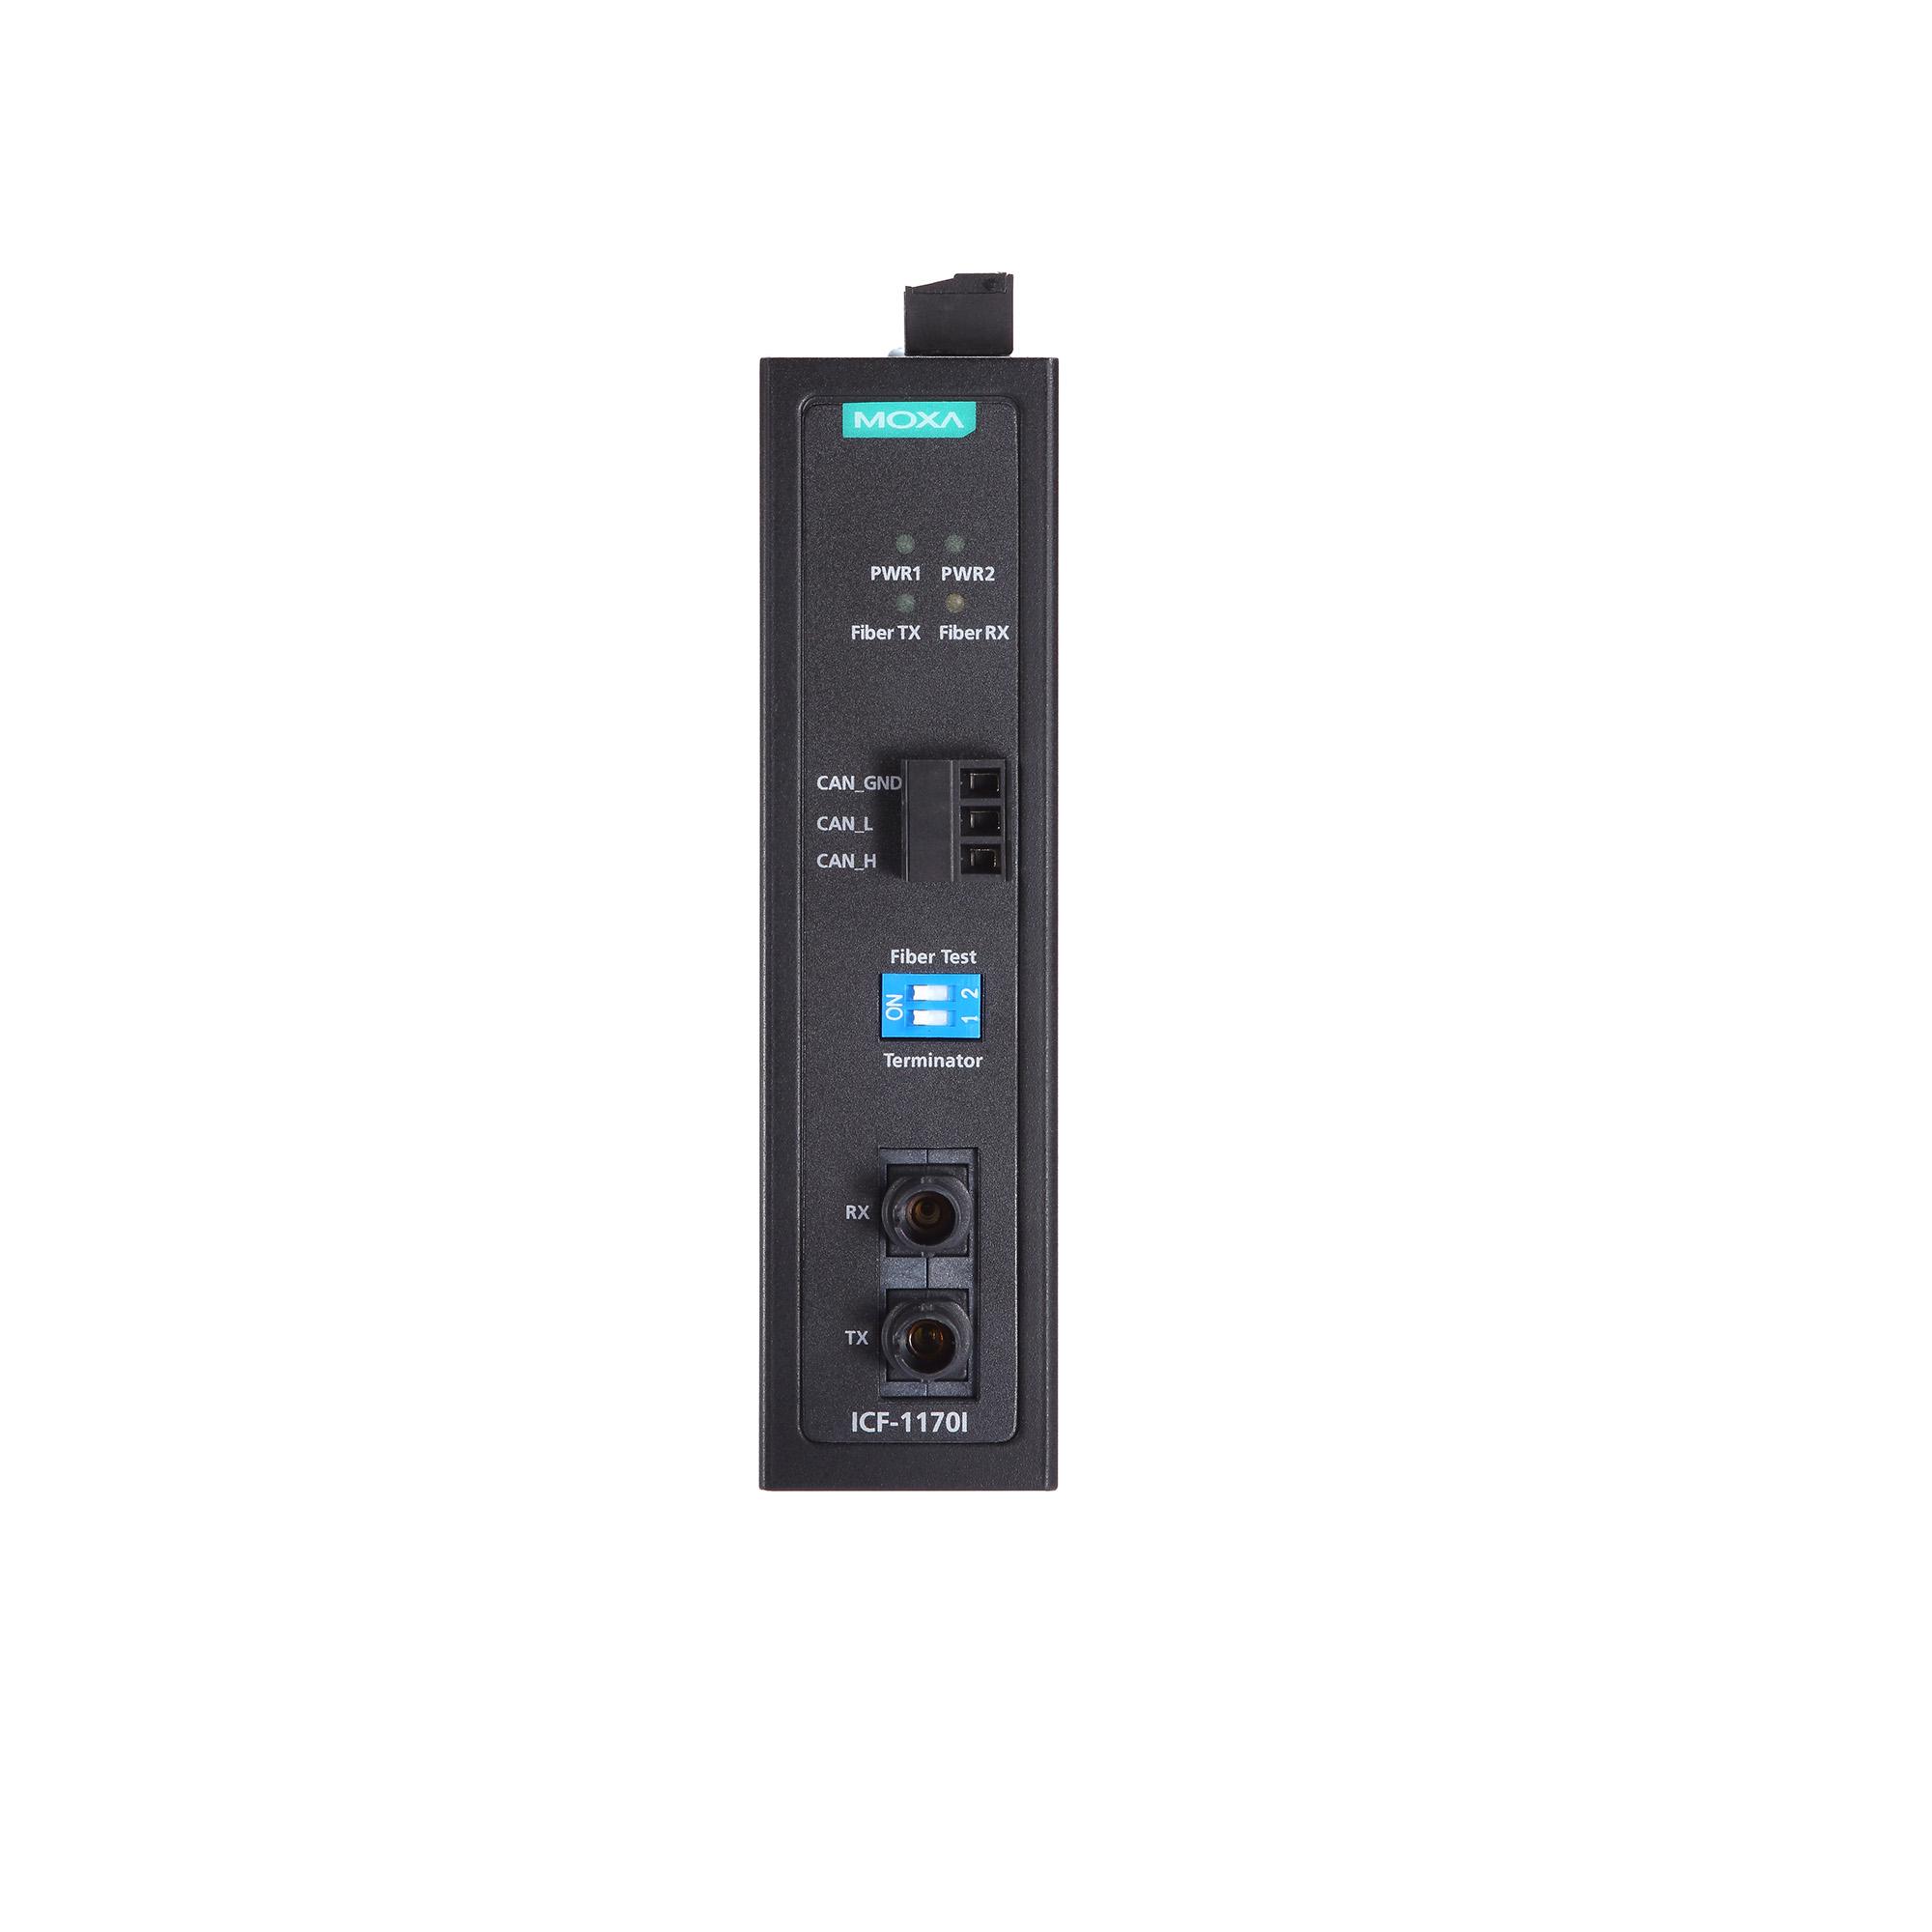 ICF-1170I Series - Fieldbus-to-Fiber Converters | MOXA